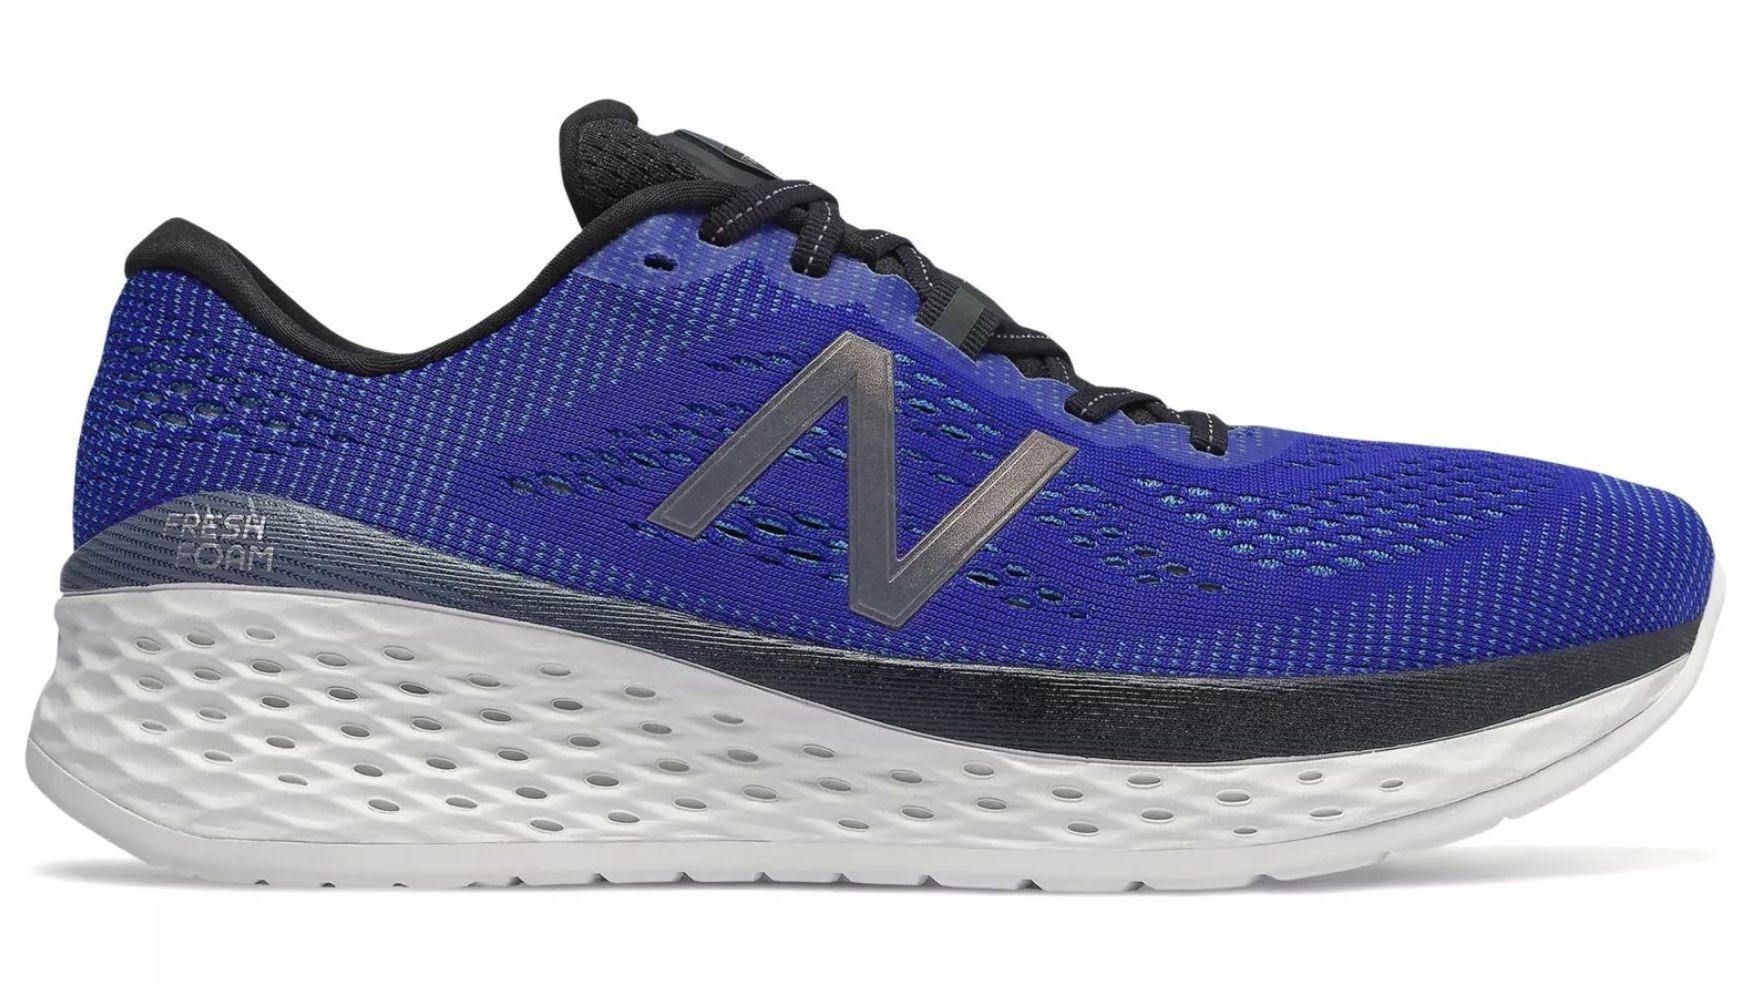 best new balance running shoes for men